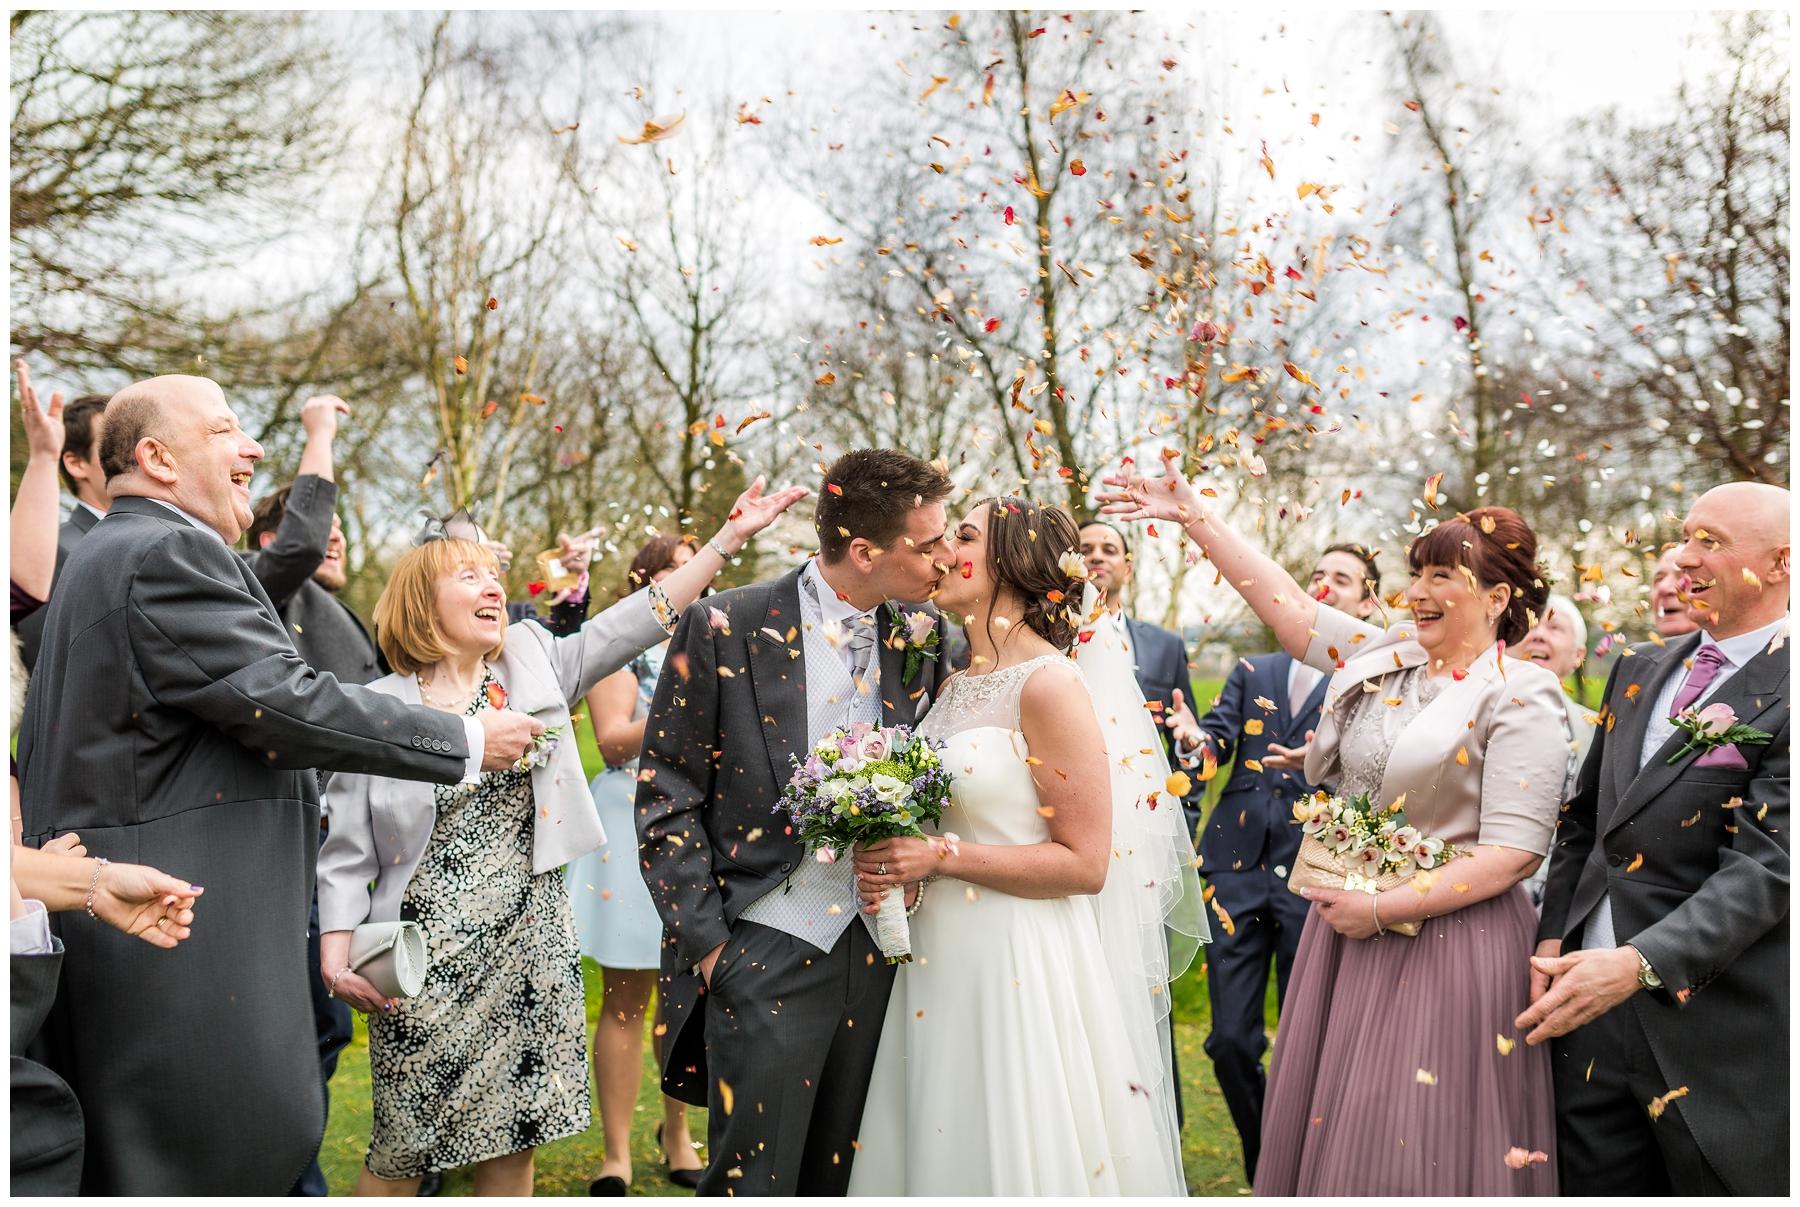 holland-hall-wedding-photography-becky-jason_0025.jpg